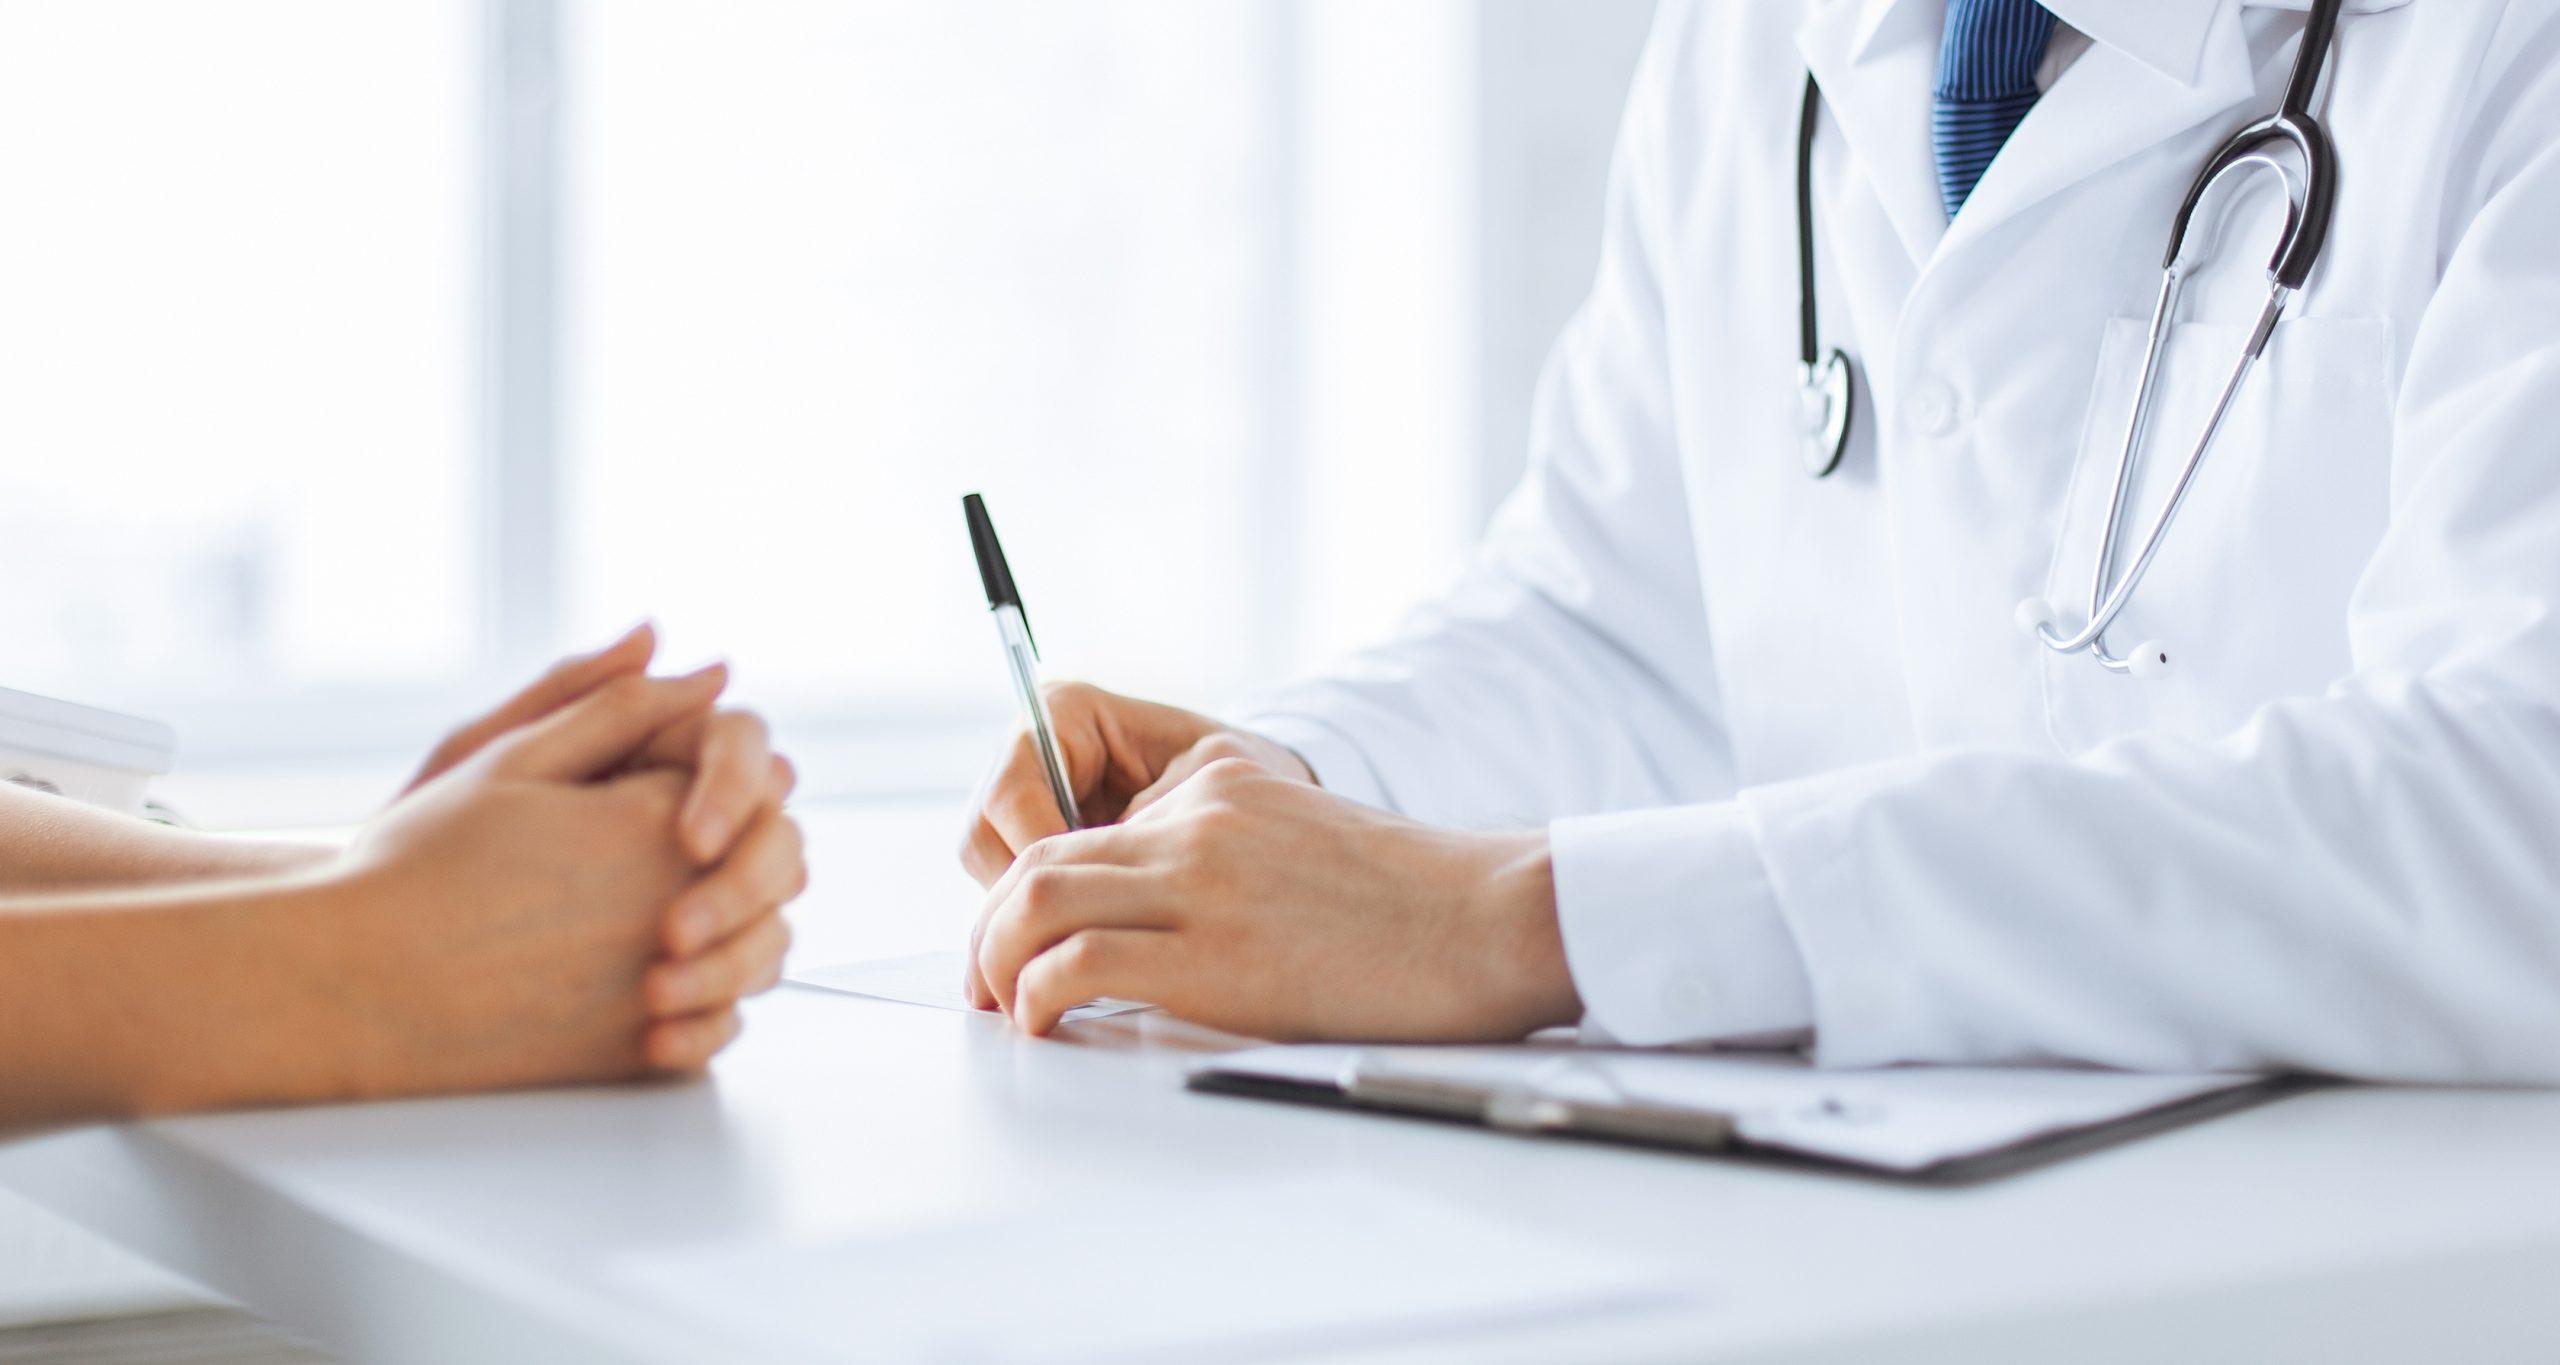 Doctor misdiagnosing patient